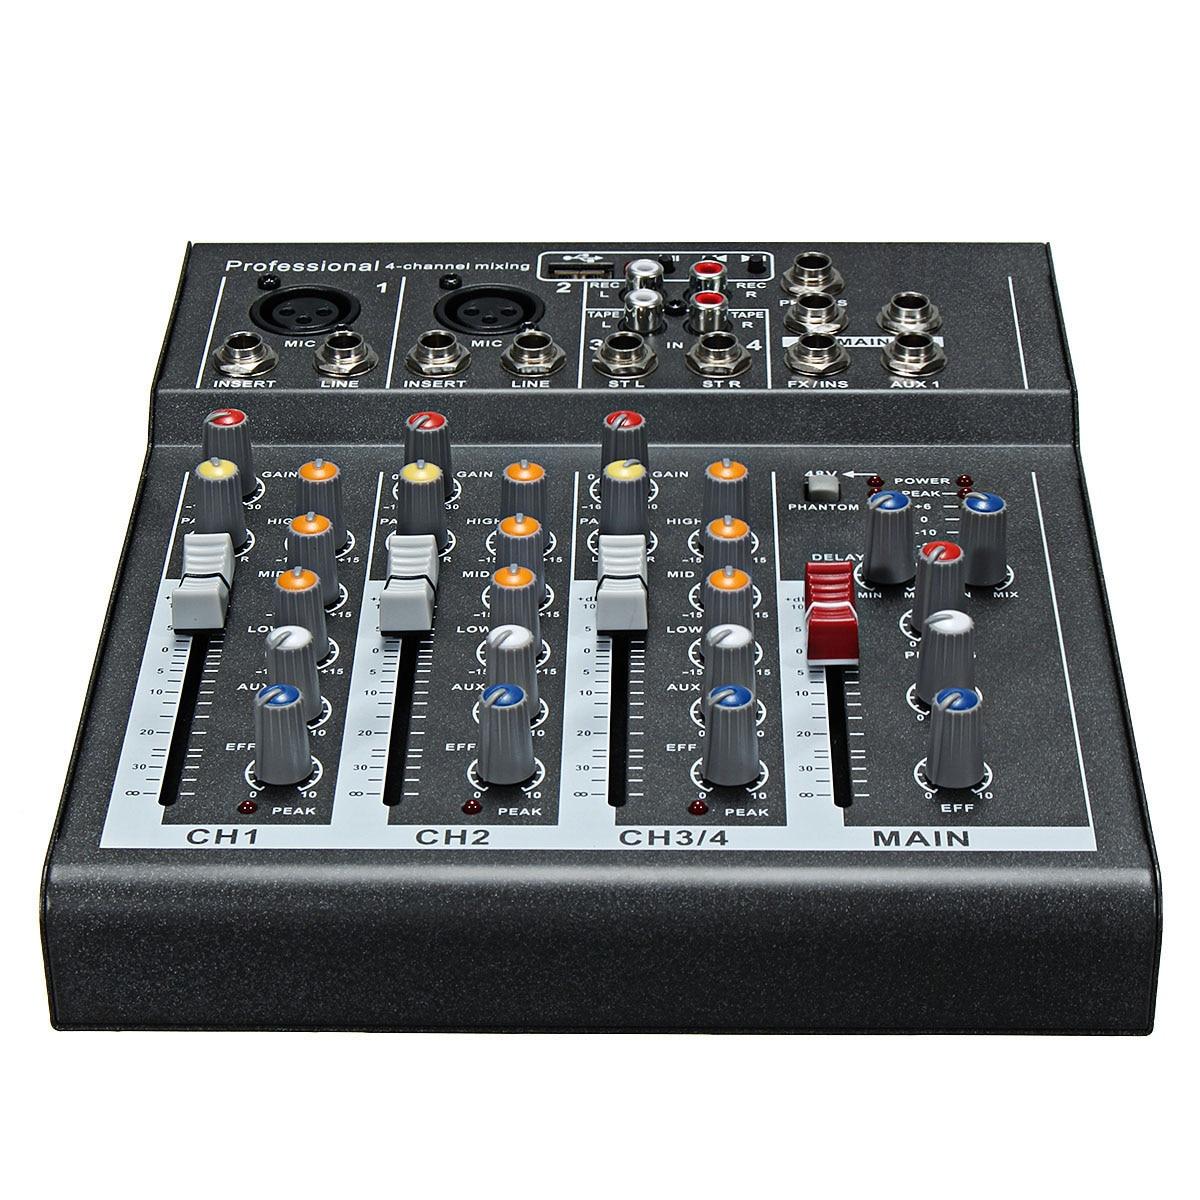 CLAIT Karaoke Mixer Professional 4 Channel Studio Audio Mixing Console Amplifier Digital Mini Microphone Sound Mixer Sound Card